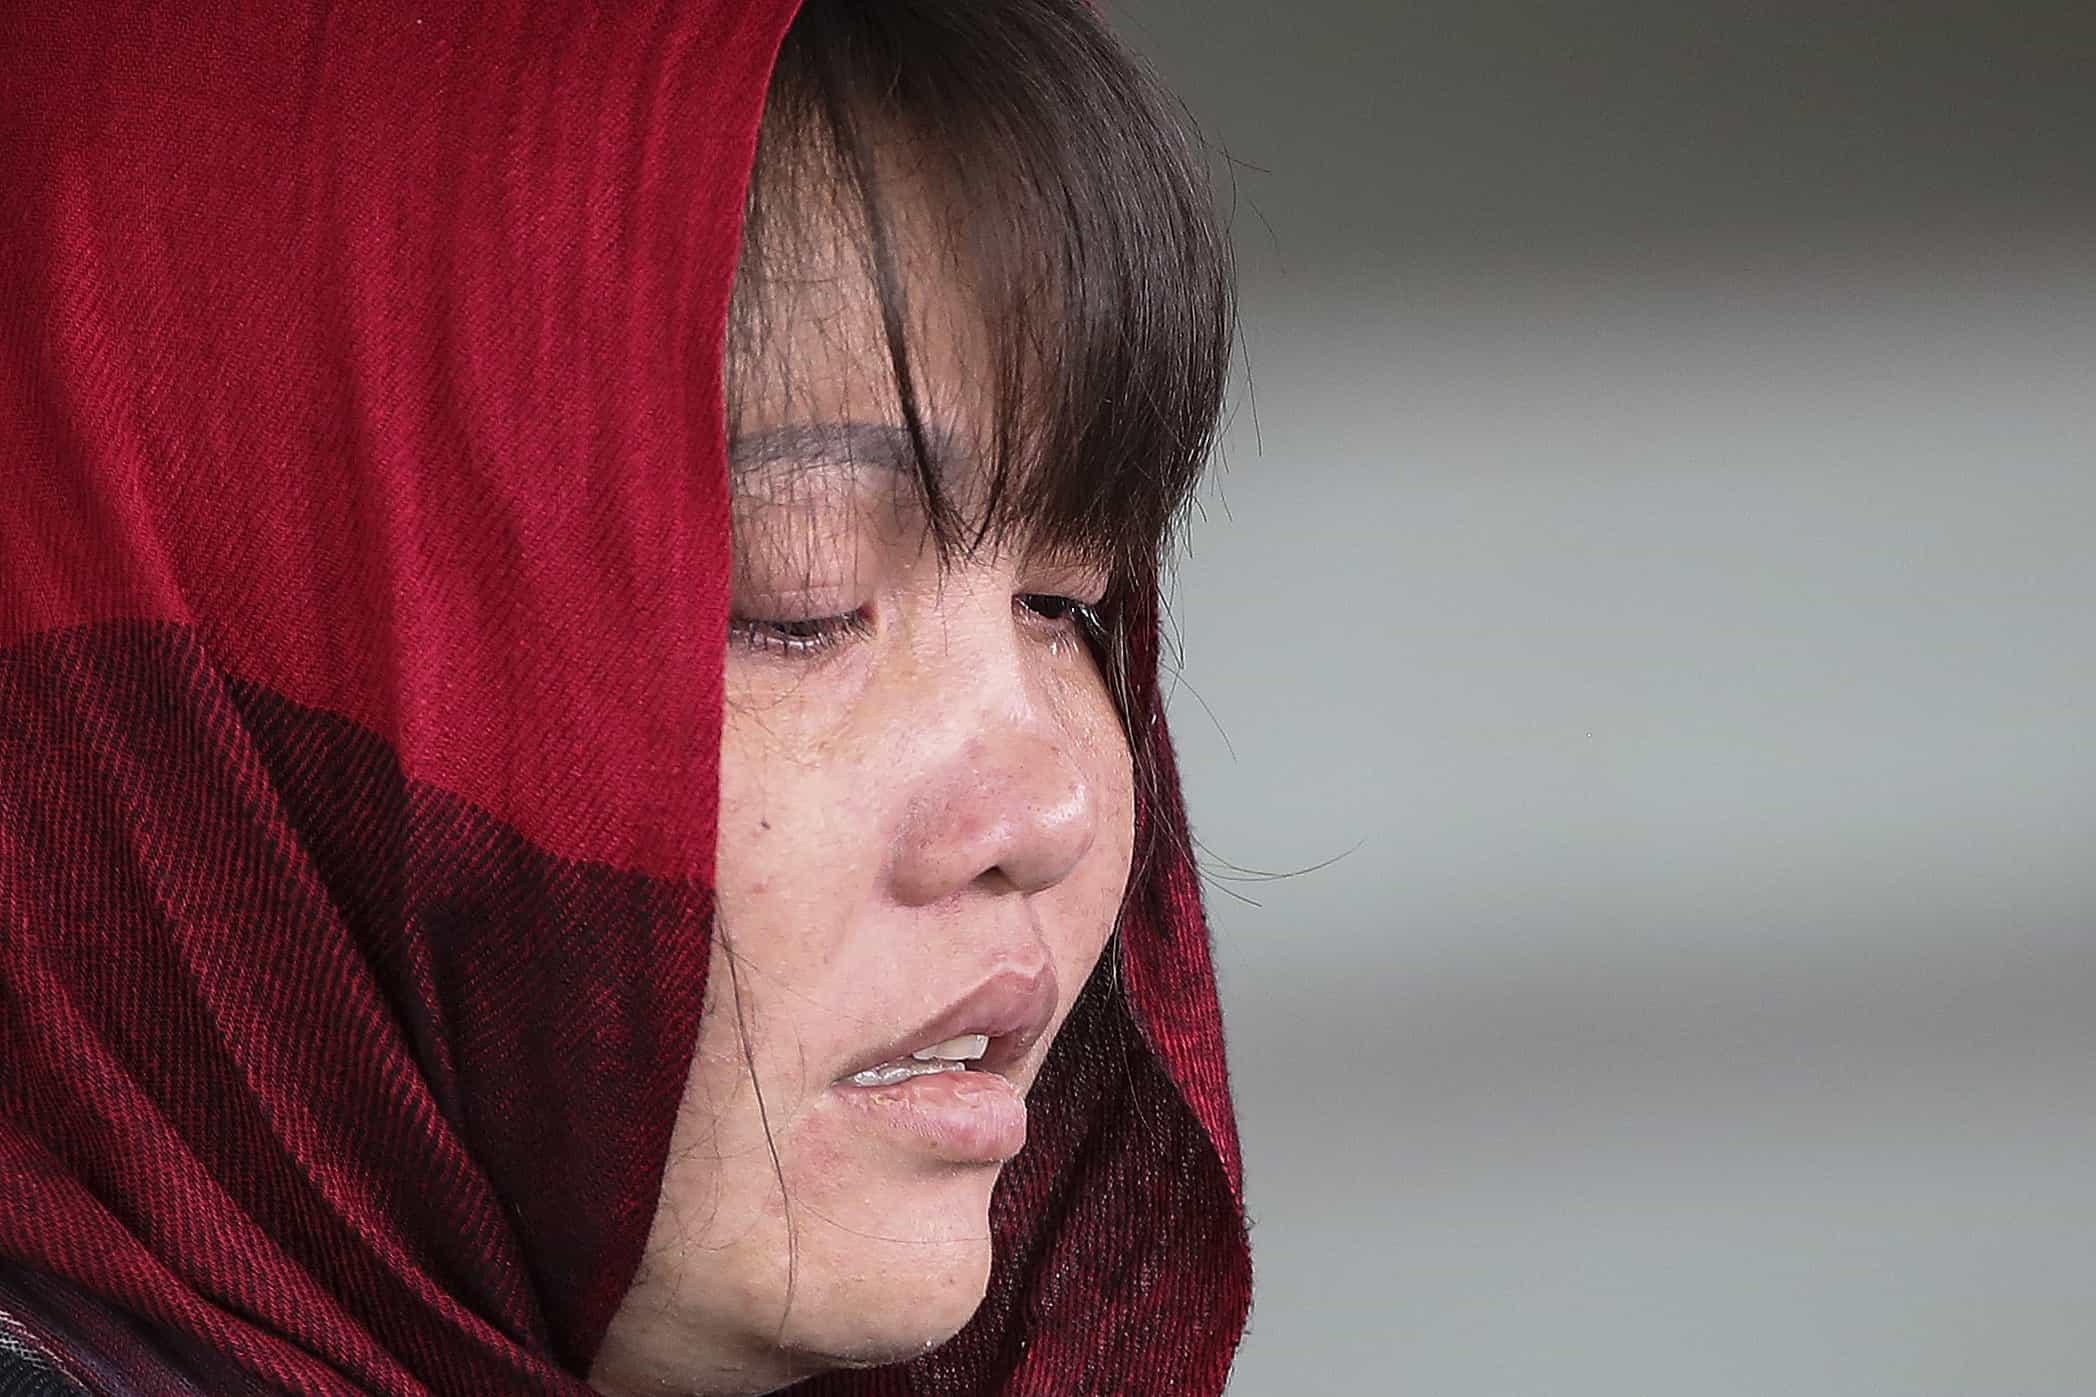 Tribunal nega libertar mulher acusada de matar meio-irmão de Kim Jong-un